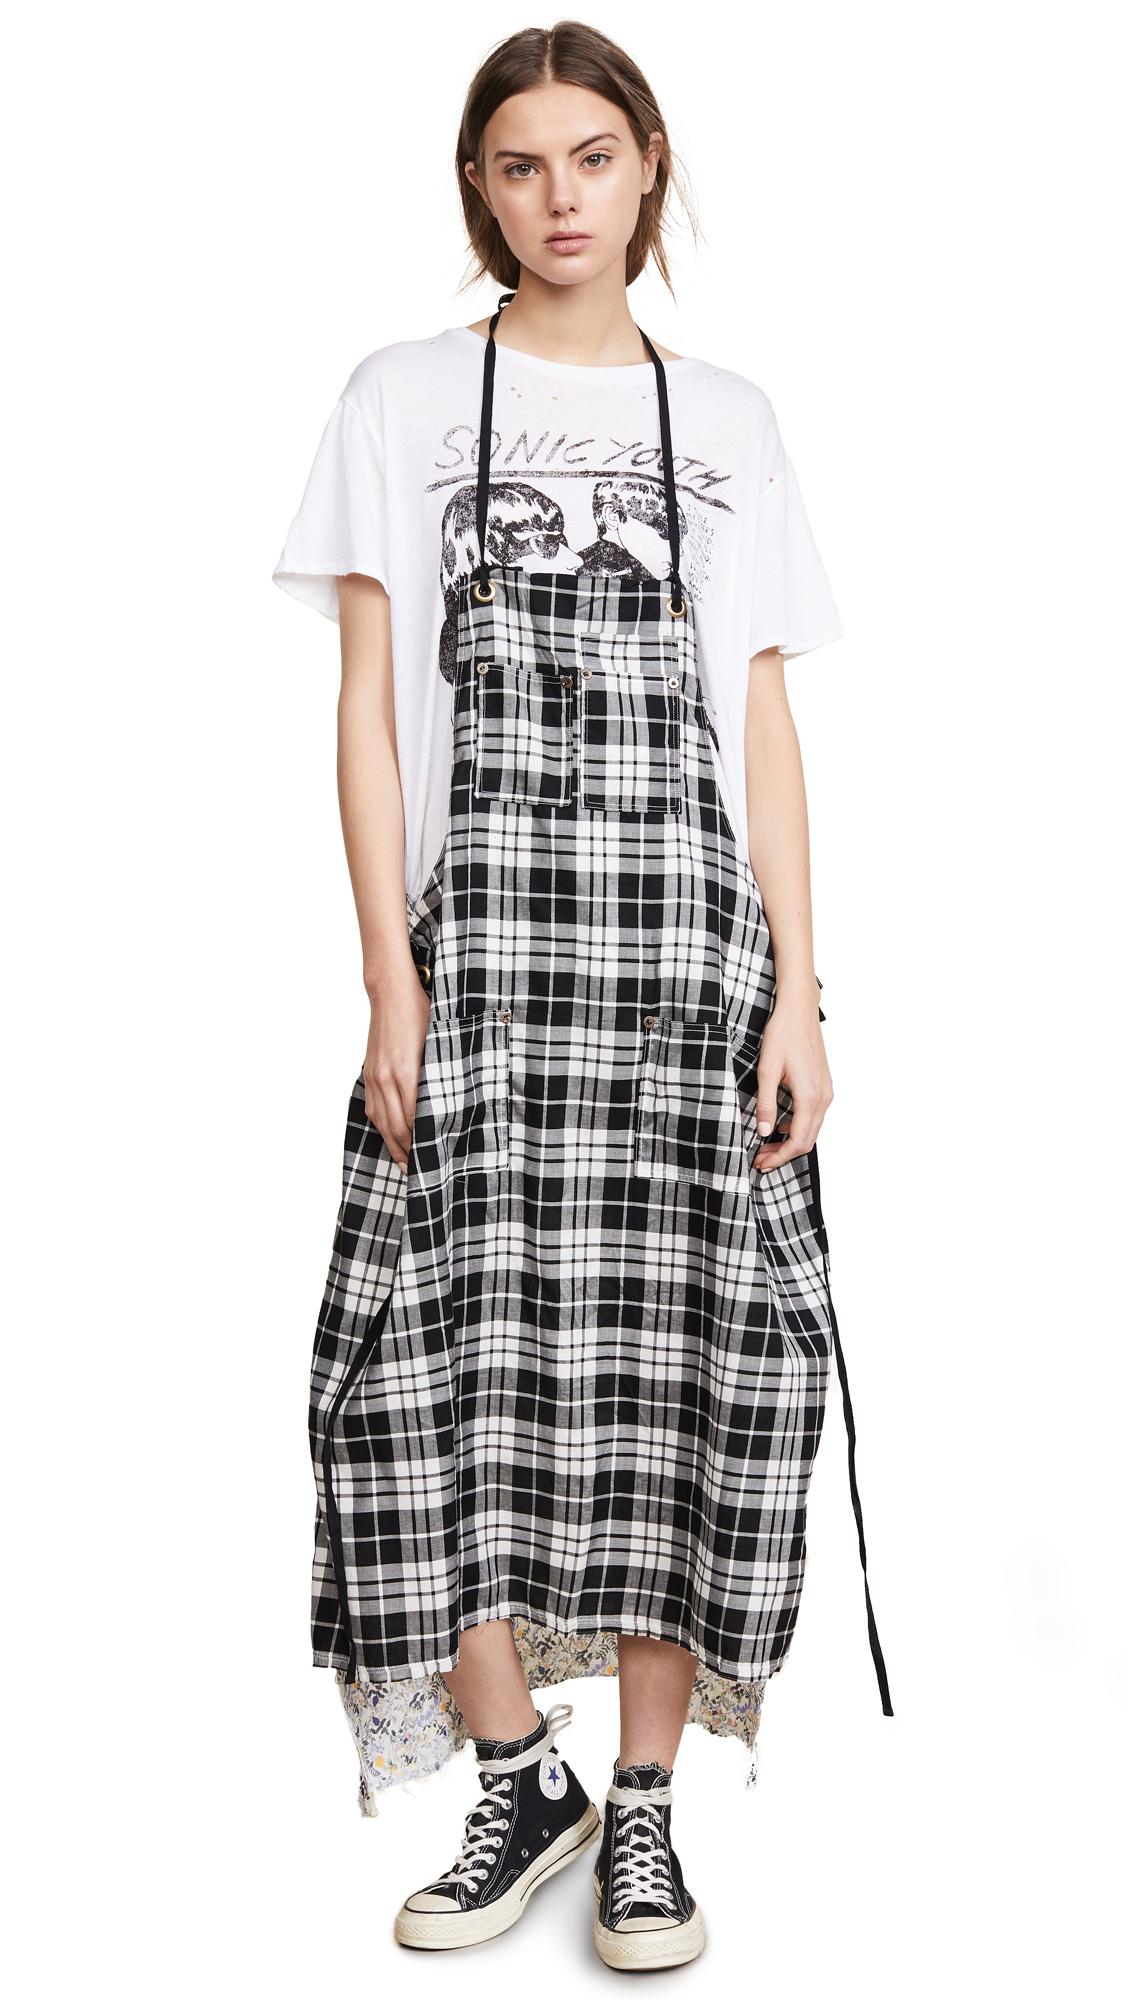 APRON T-SHIRT DRESS